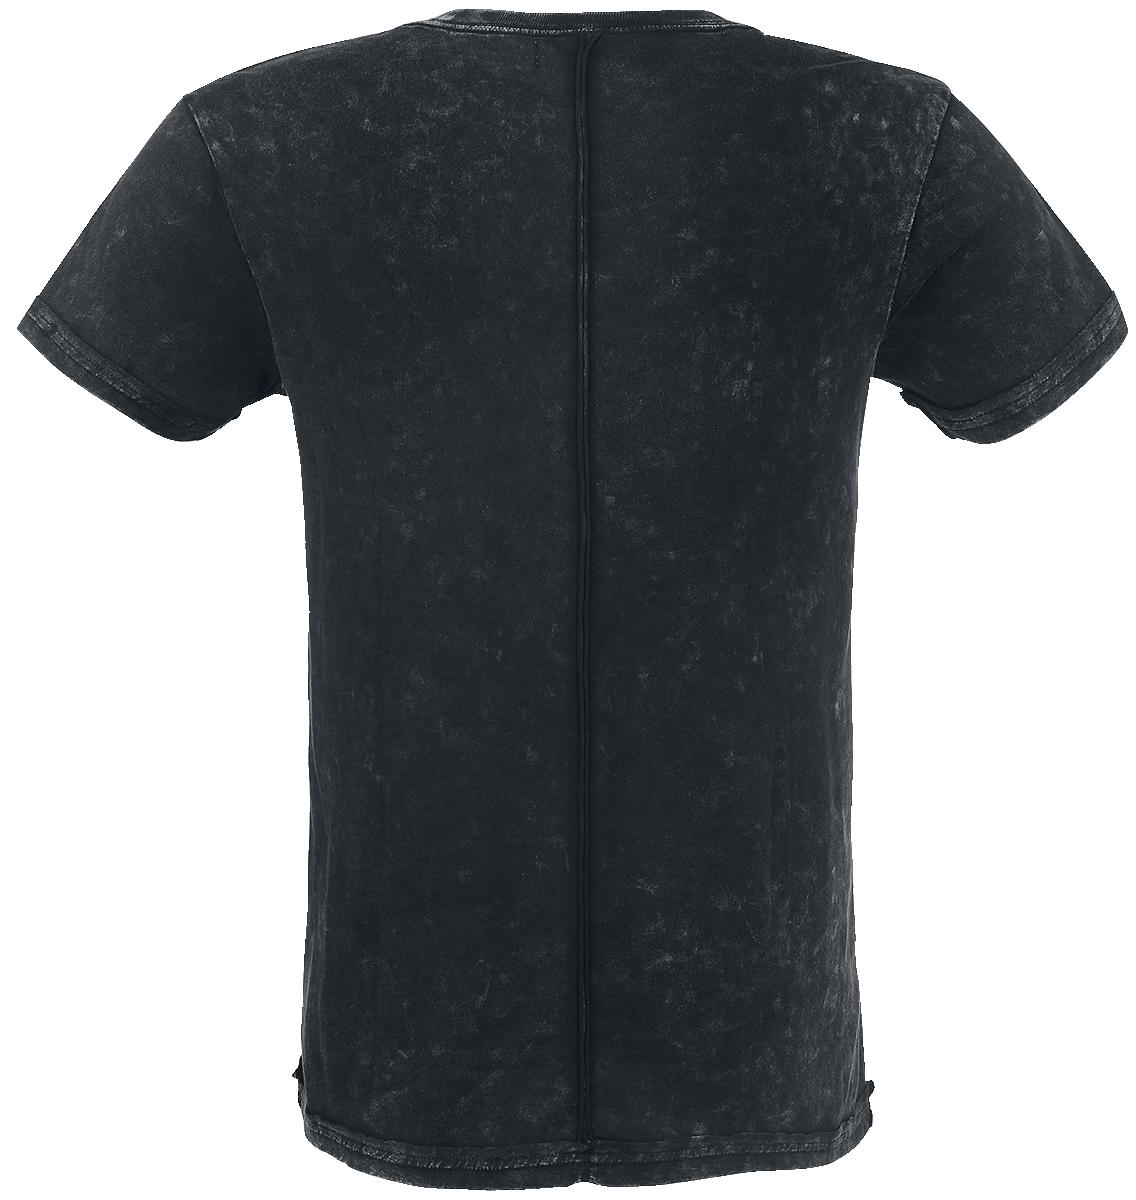 Rock Rebel by EMP Chained Skull T-Shirt mørk grå